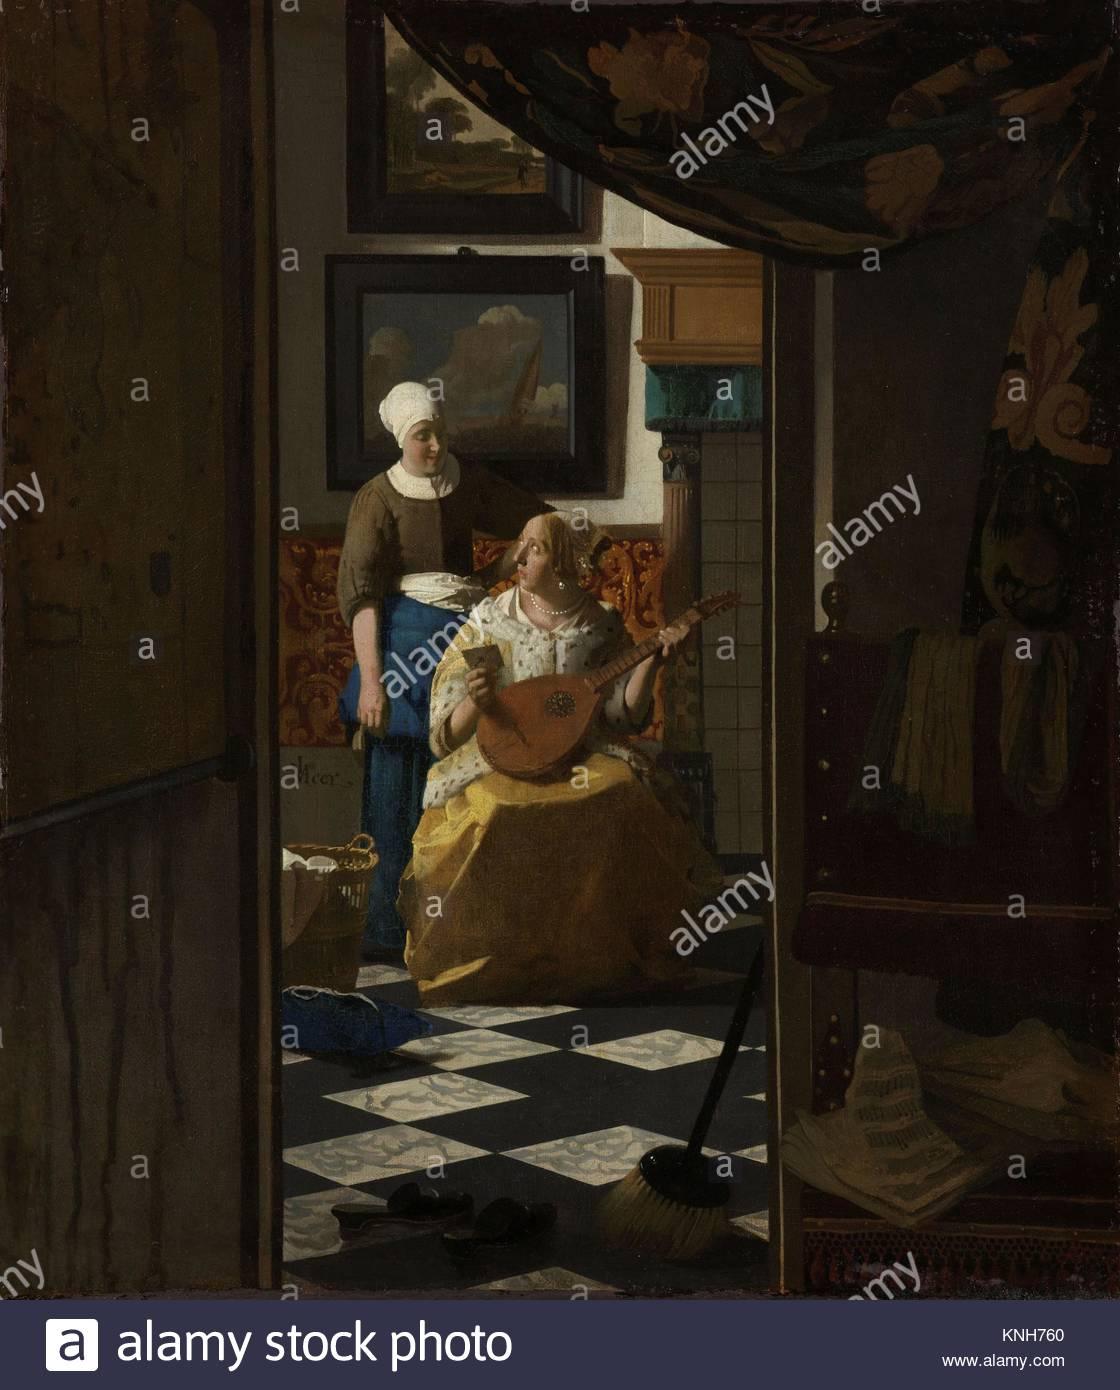 The Love Letter Johannes Vermeer, c. 1669 - c. 1670 Rijksmuseum, Netherlands, - Stock Image